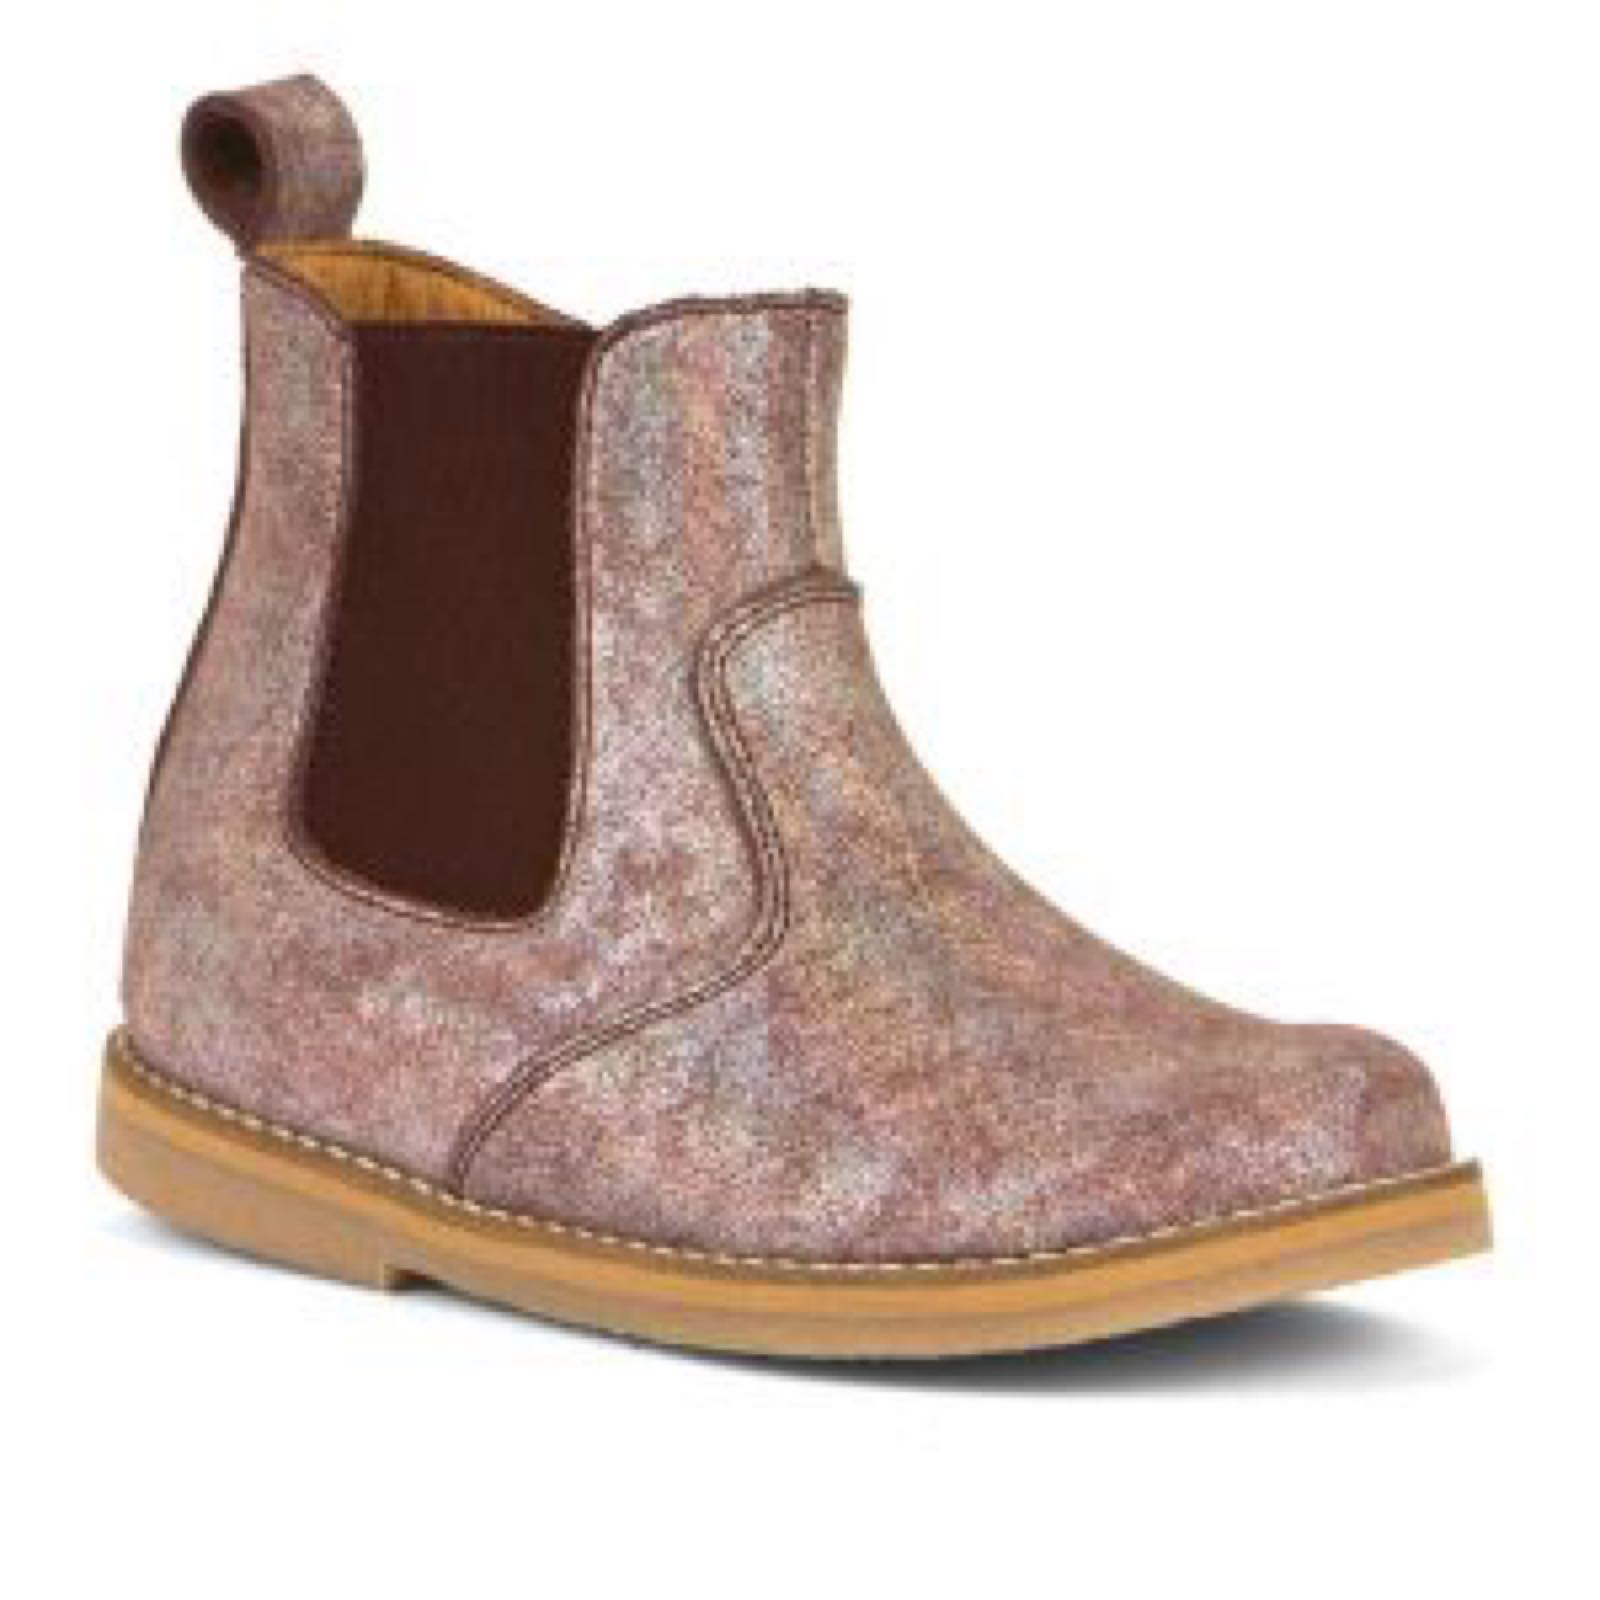 FRODDO Chelsea Boots Pink Shine G3160143-10